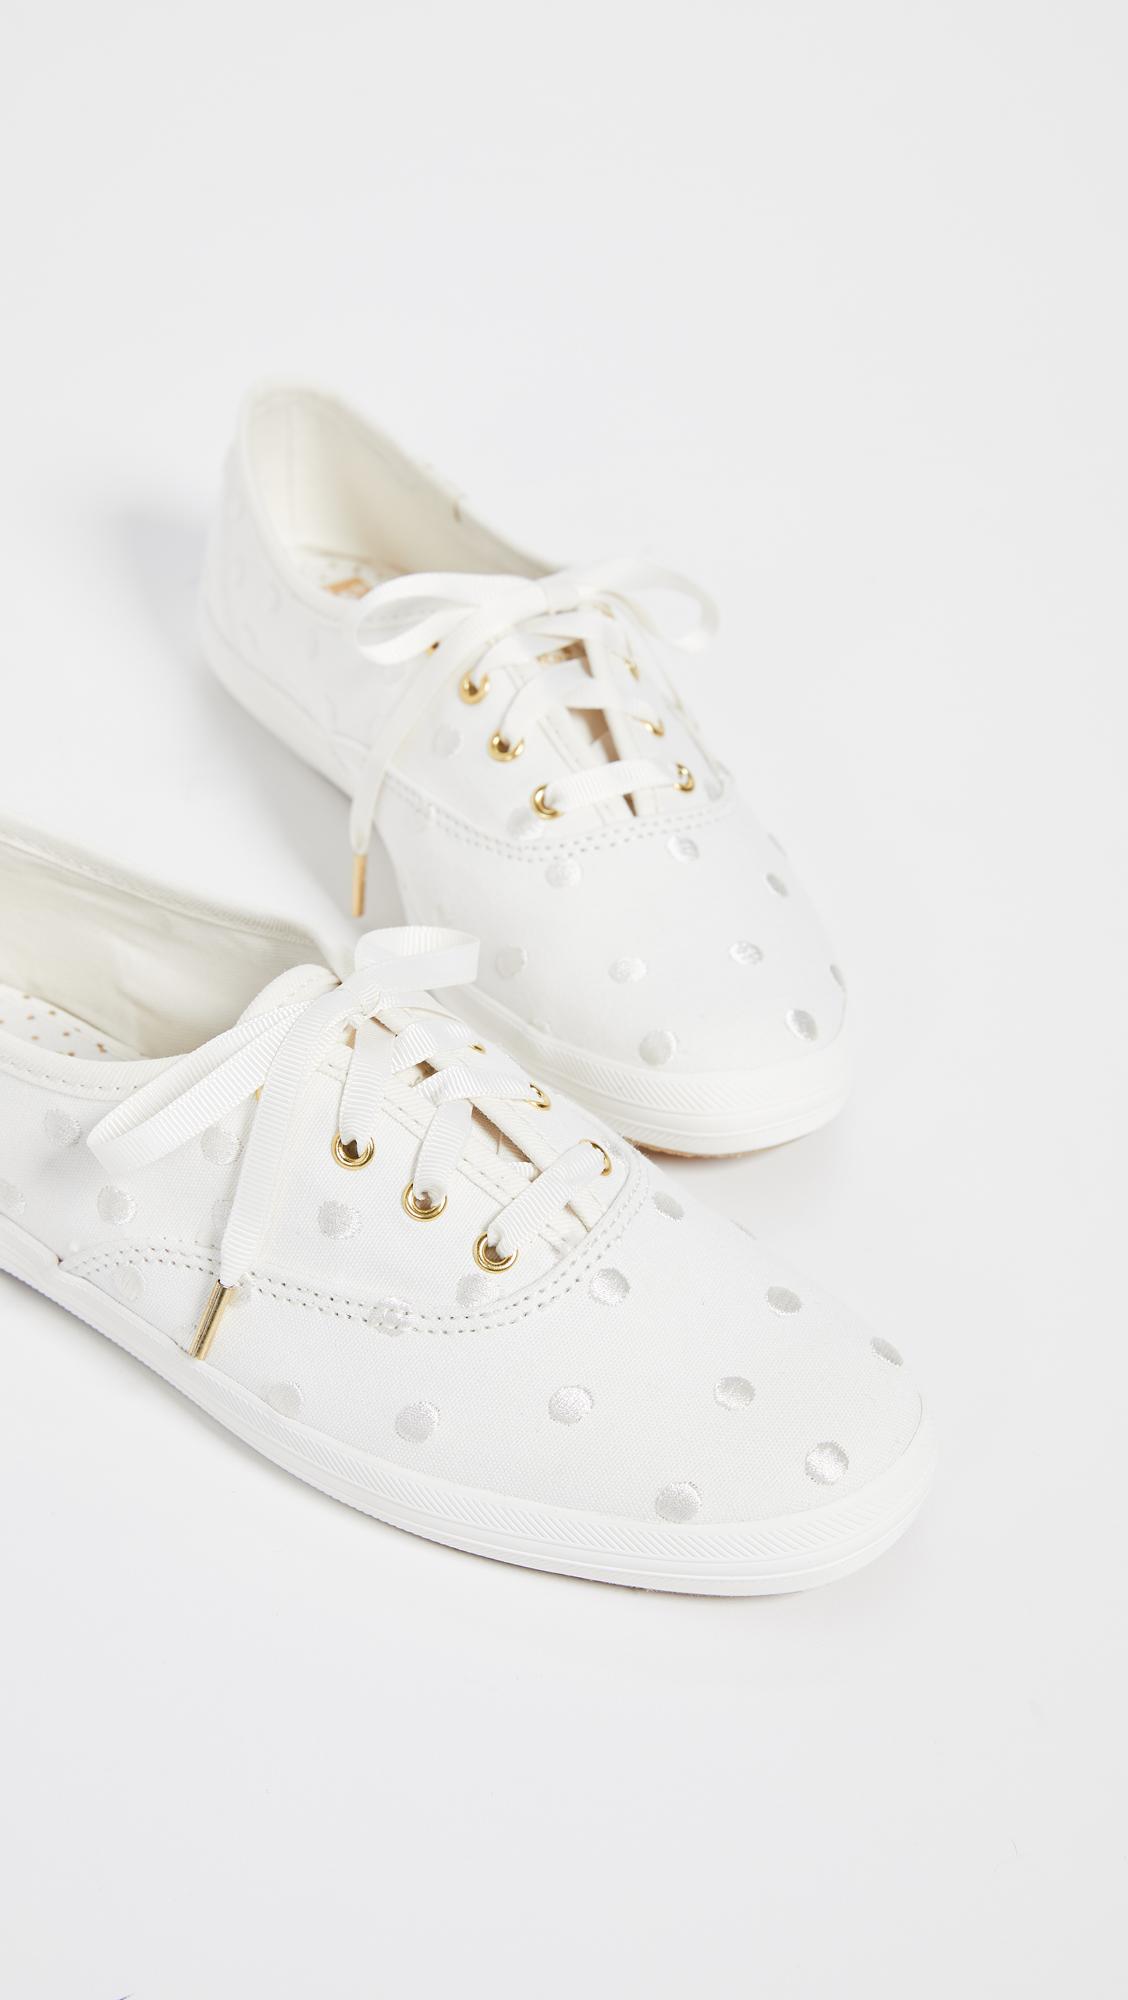 4dab1a183c4 Keds x Kate Spade New York Dancing Dot Champion Sneakers